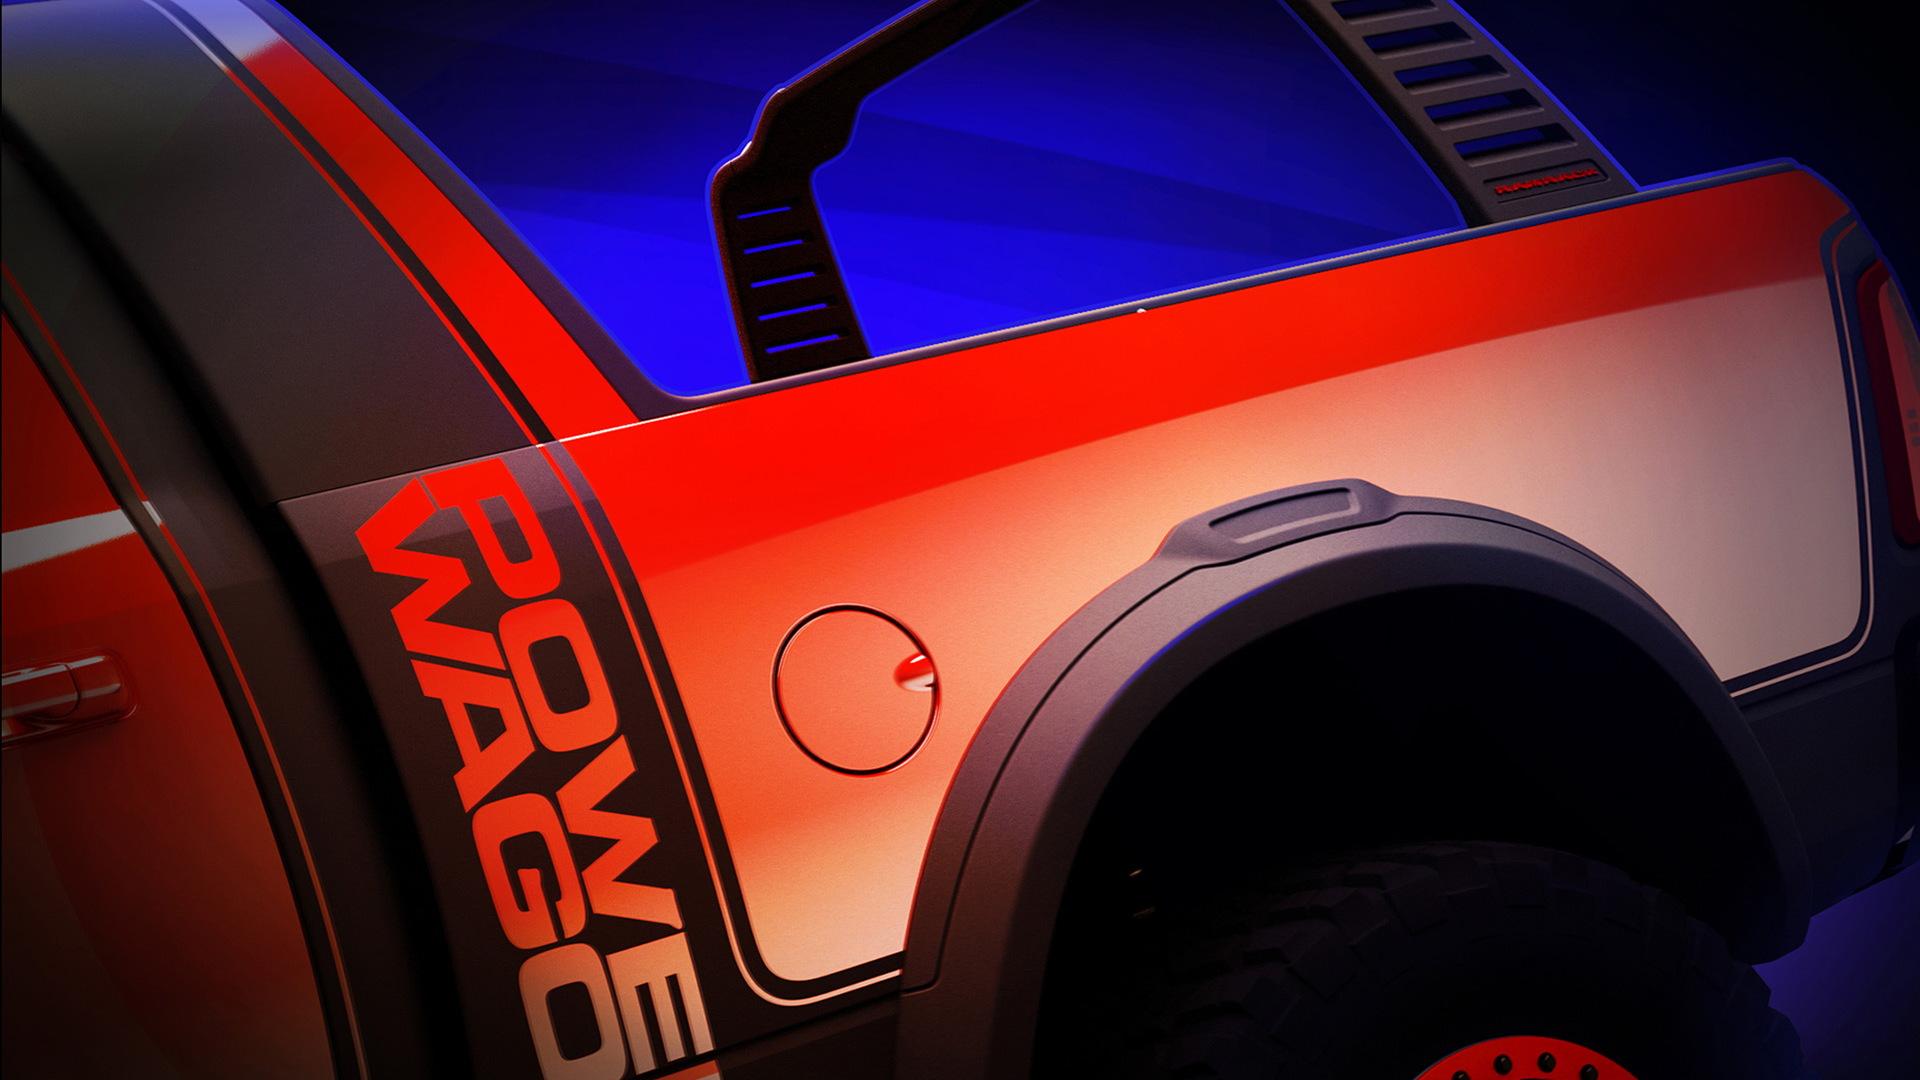 Ram Power Wagon Mopar concept, 2016 SEMA show